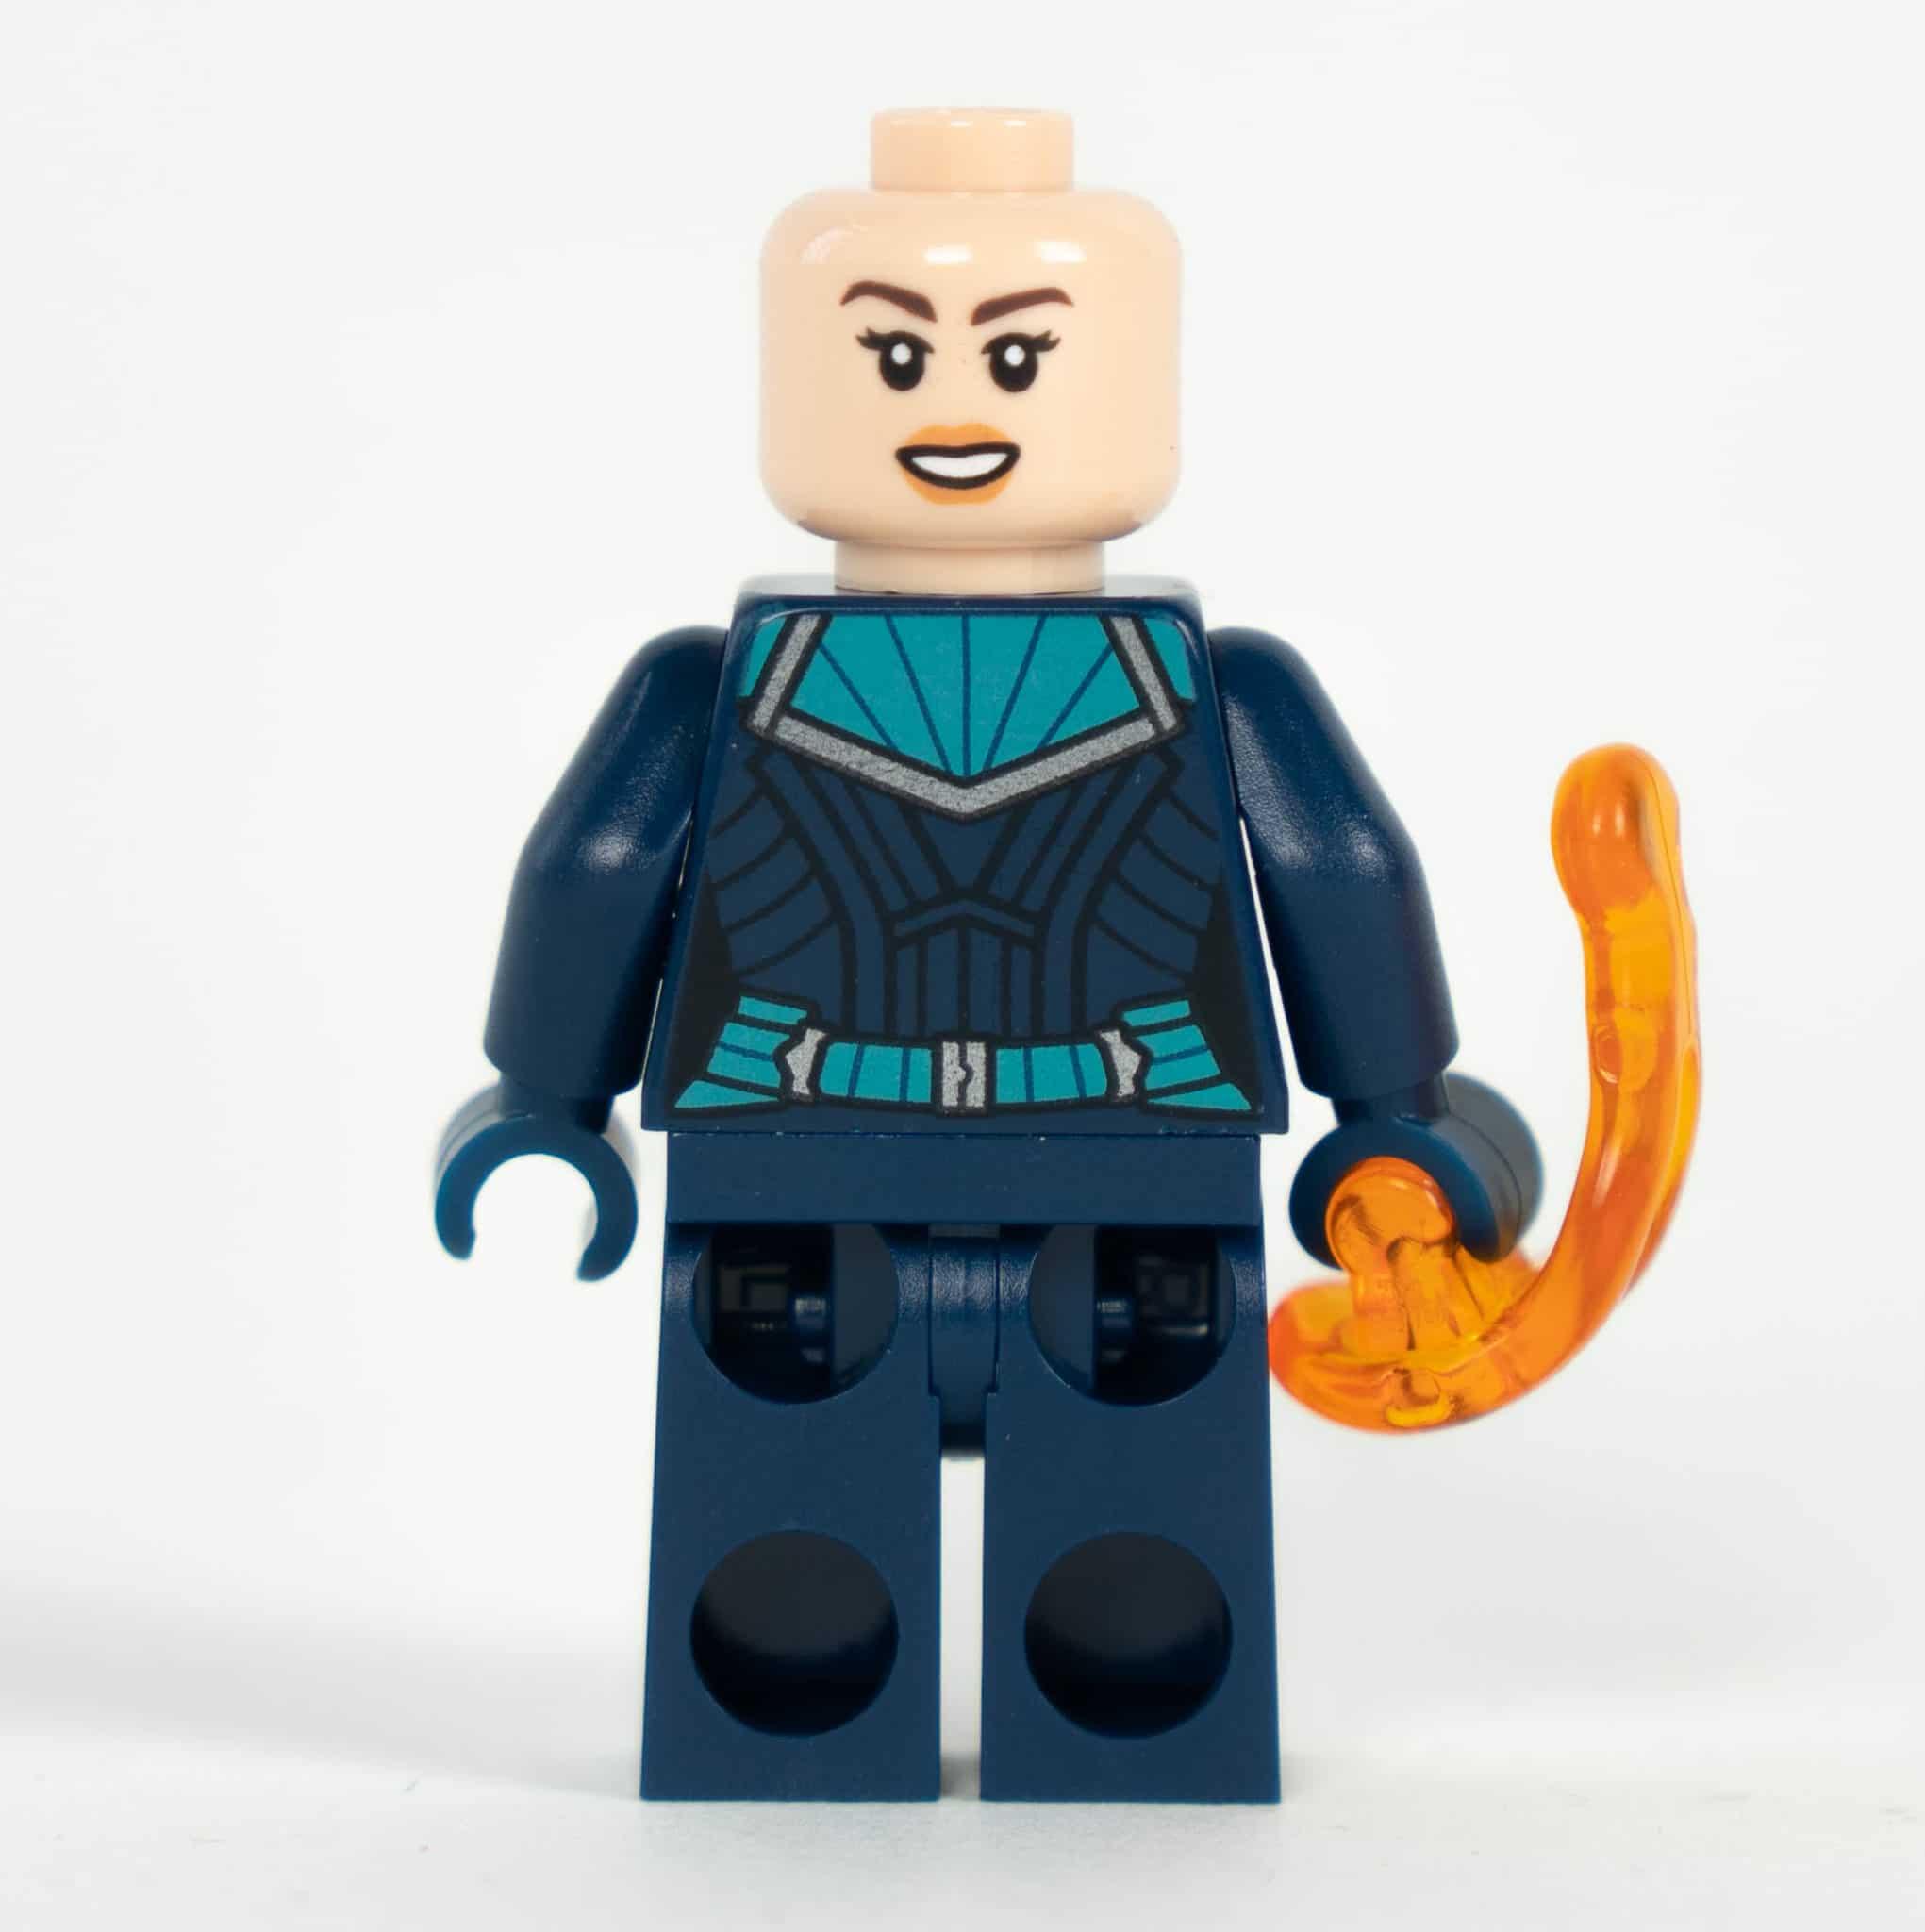 LEGO sh605: Captain Marvel in Kree Starforce Uniform